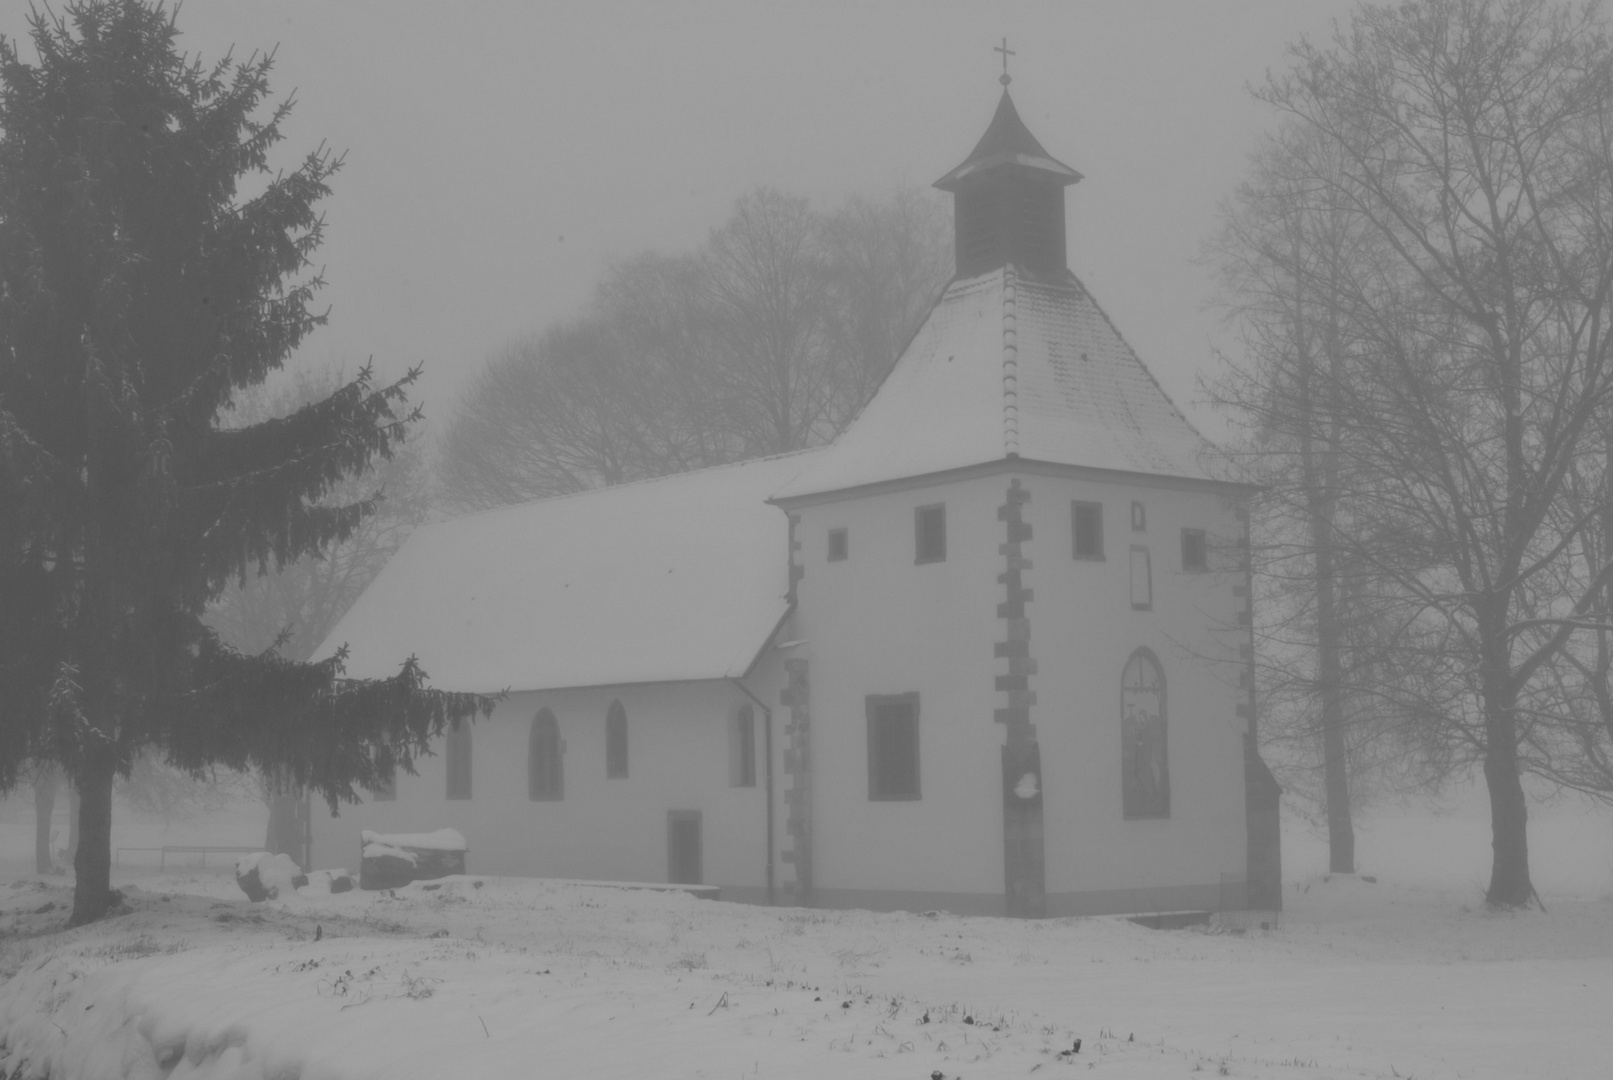 Wallfahrtskirche !